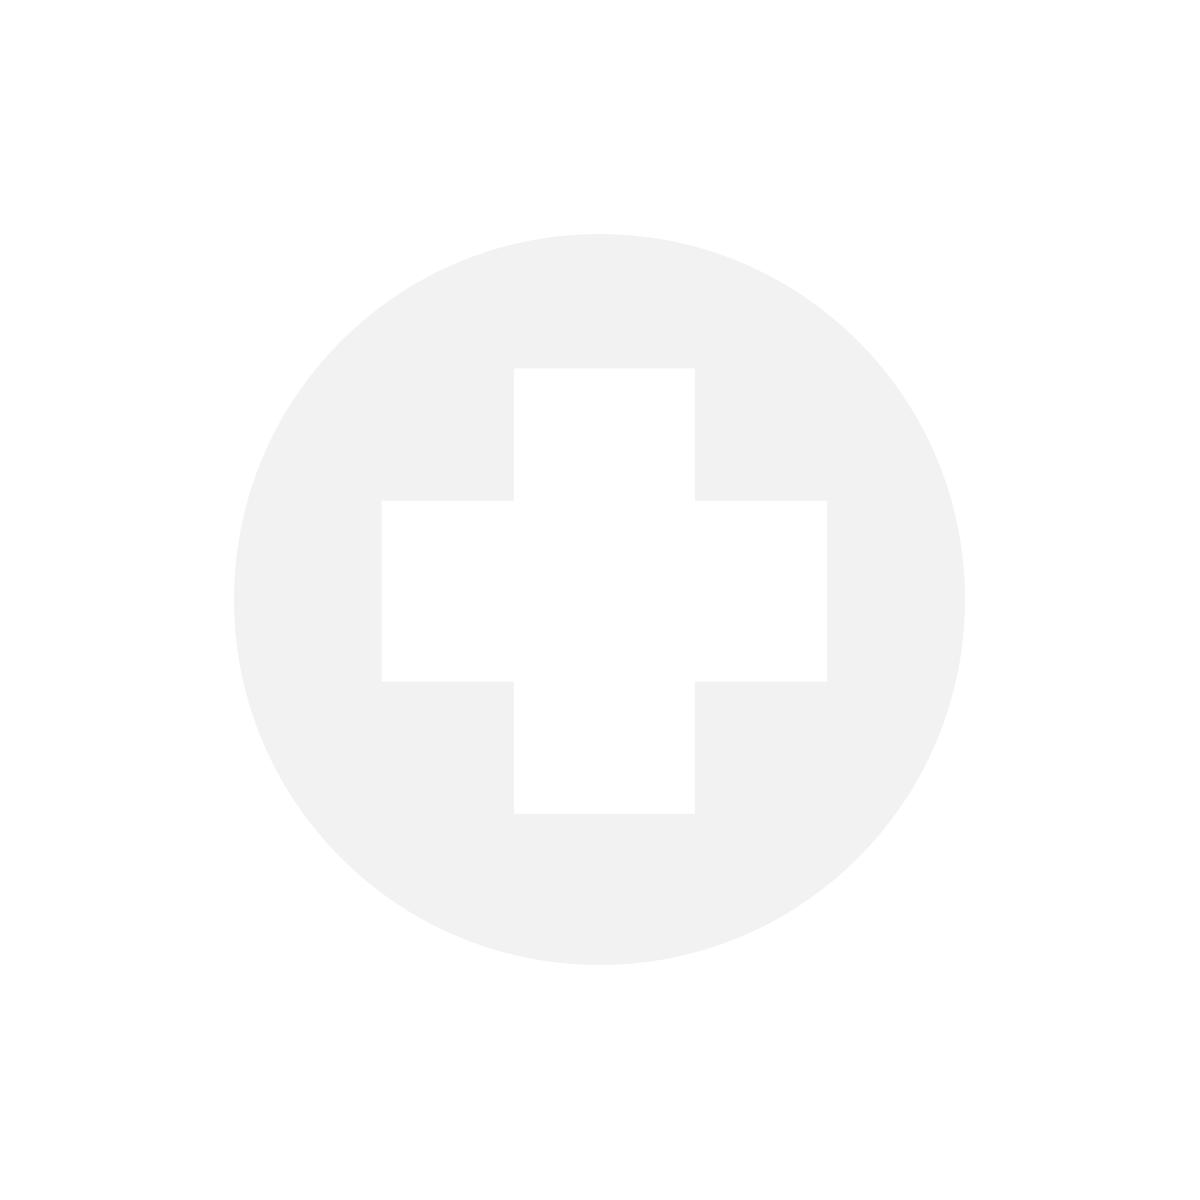 Draps d'examen 2 plis - 150 formats Physiotherapie.com